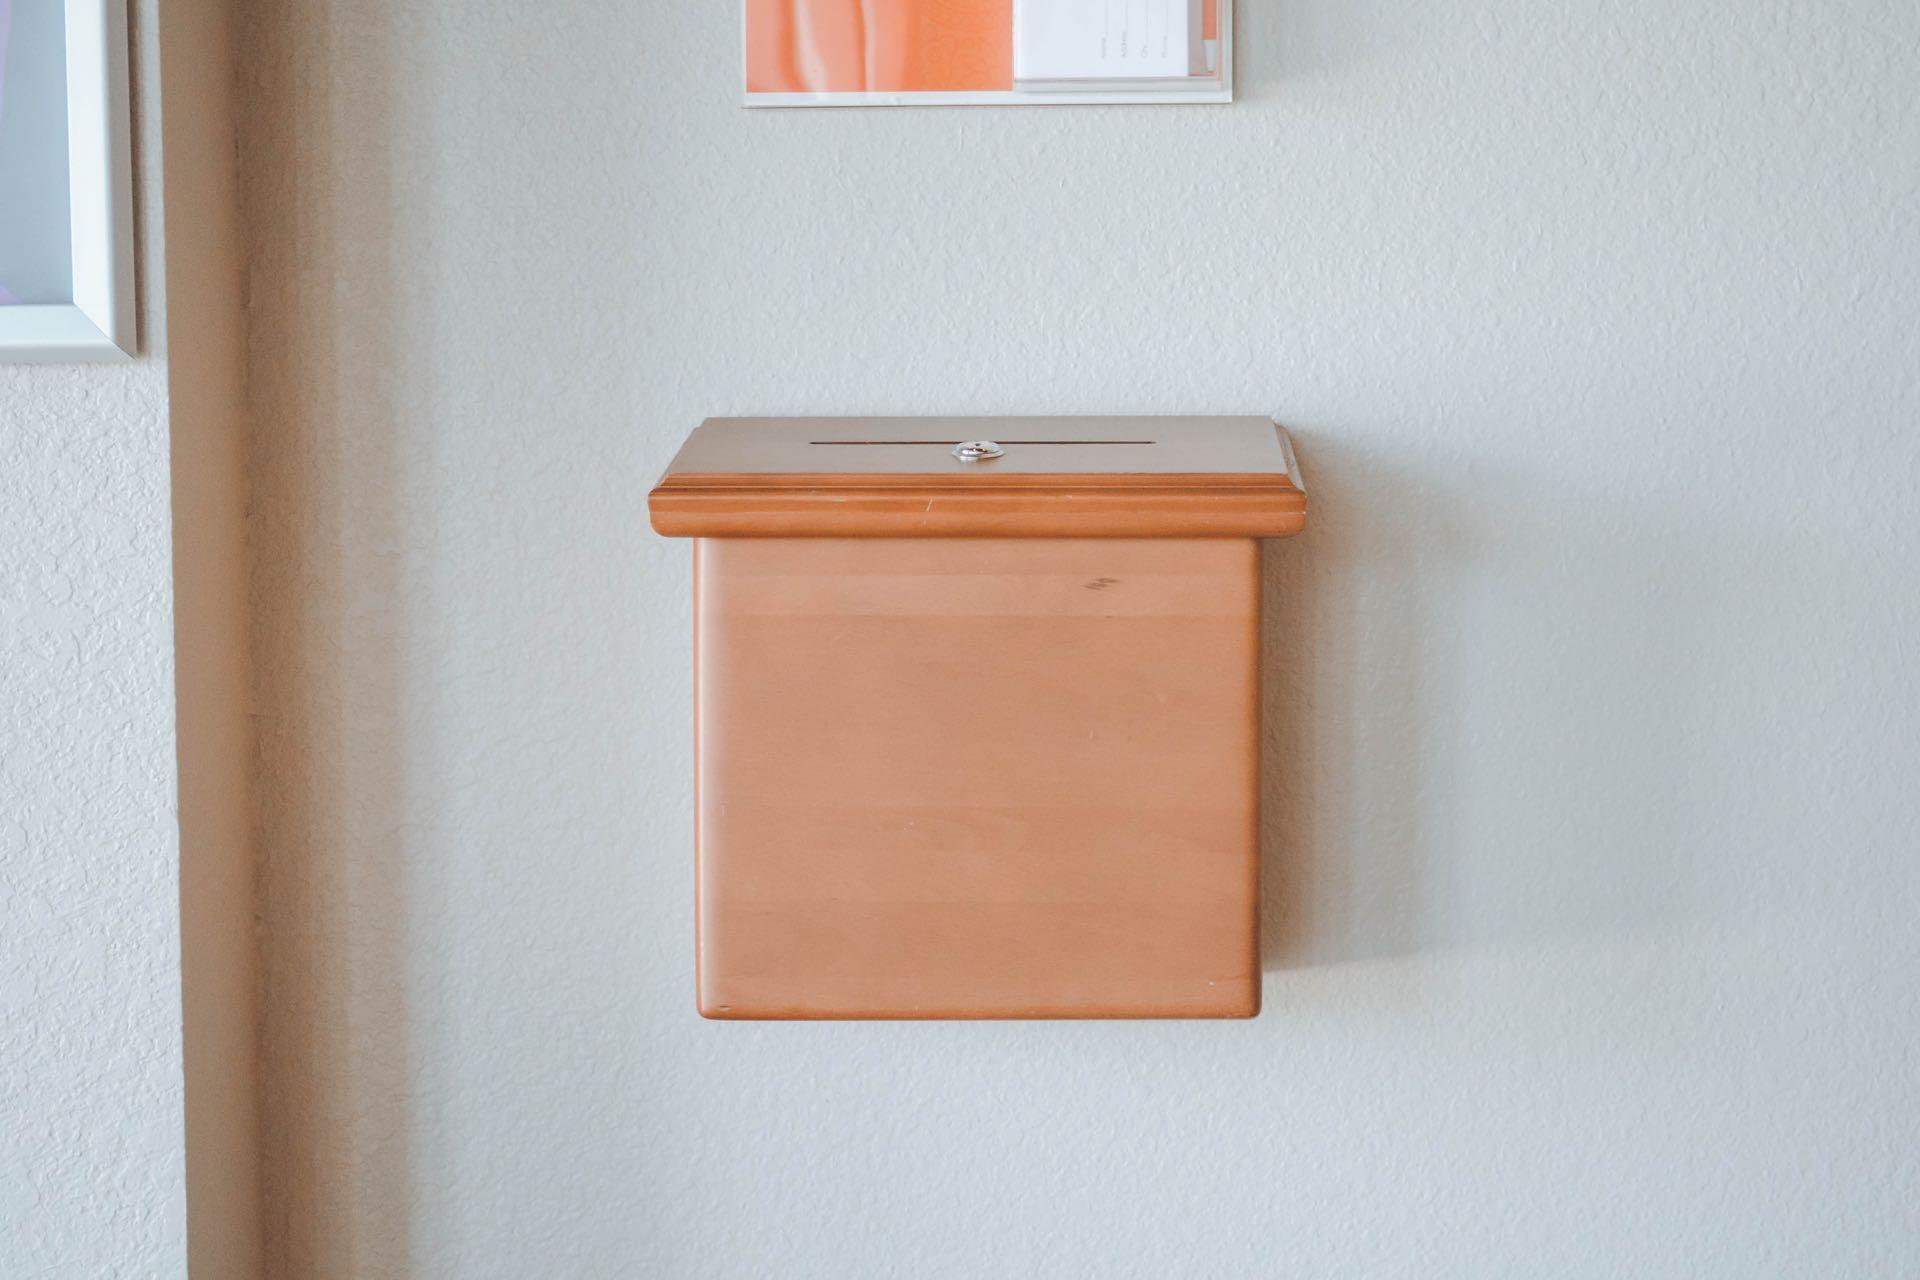 Donation box on wall